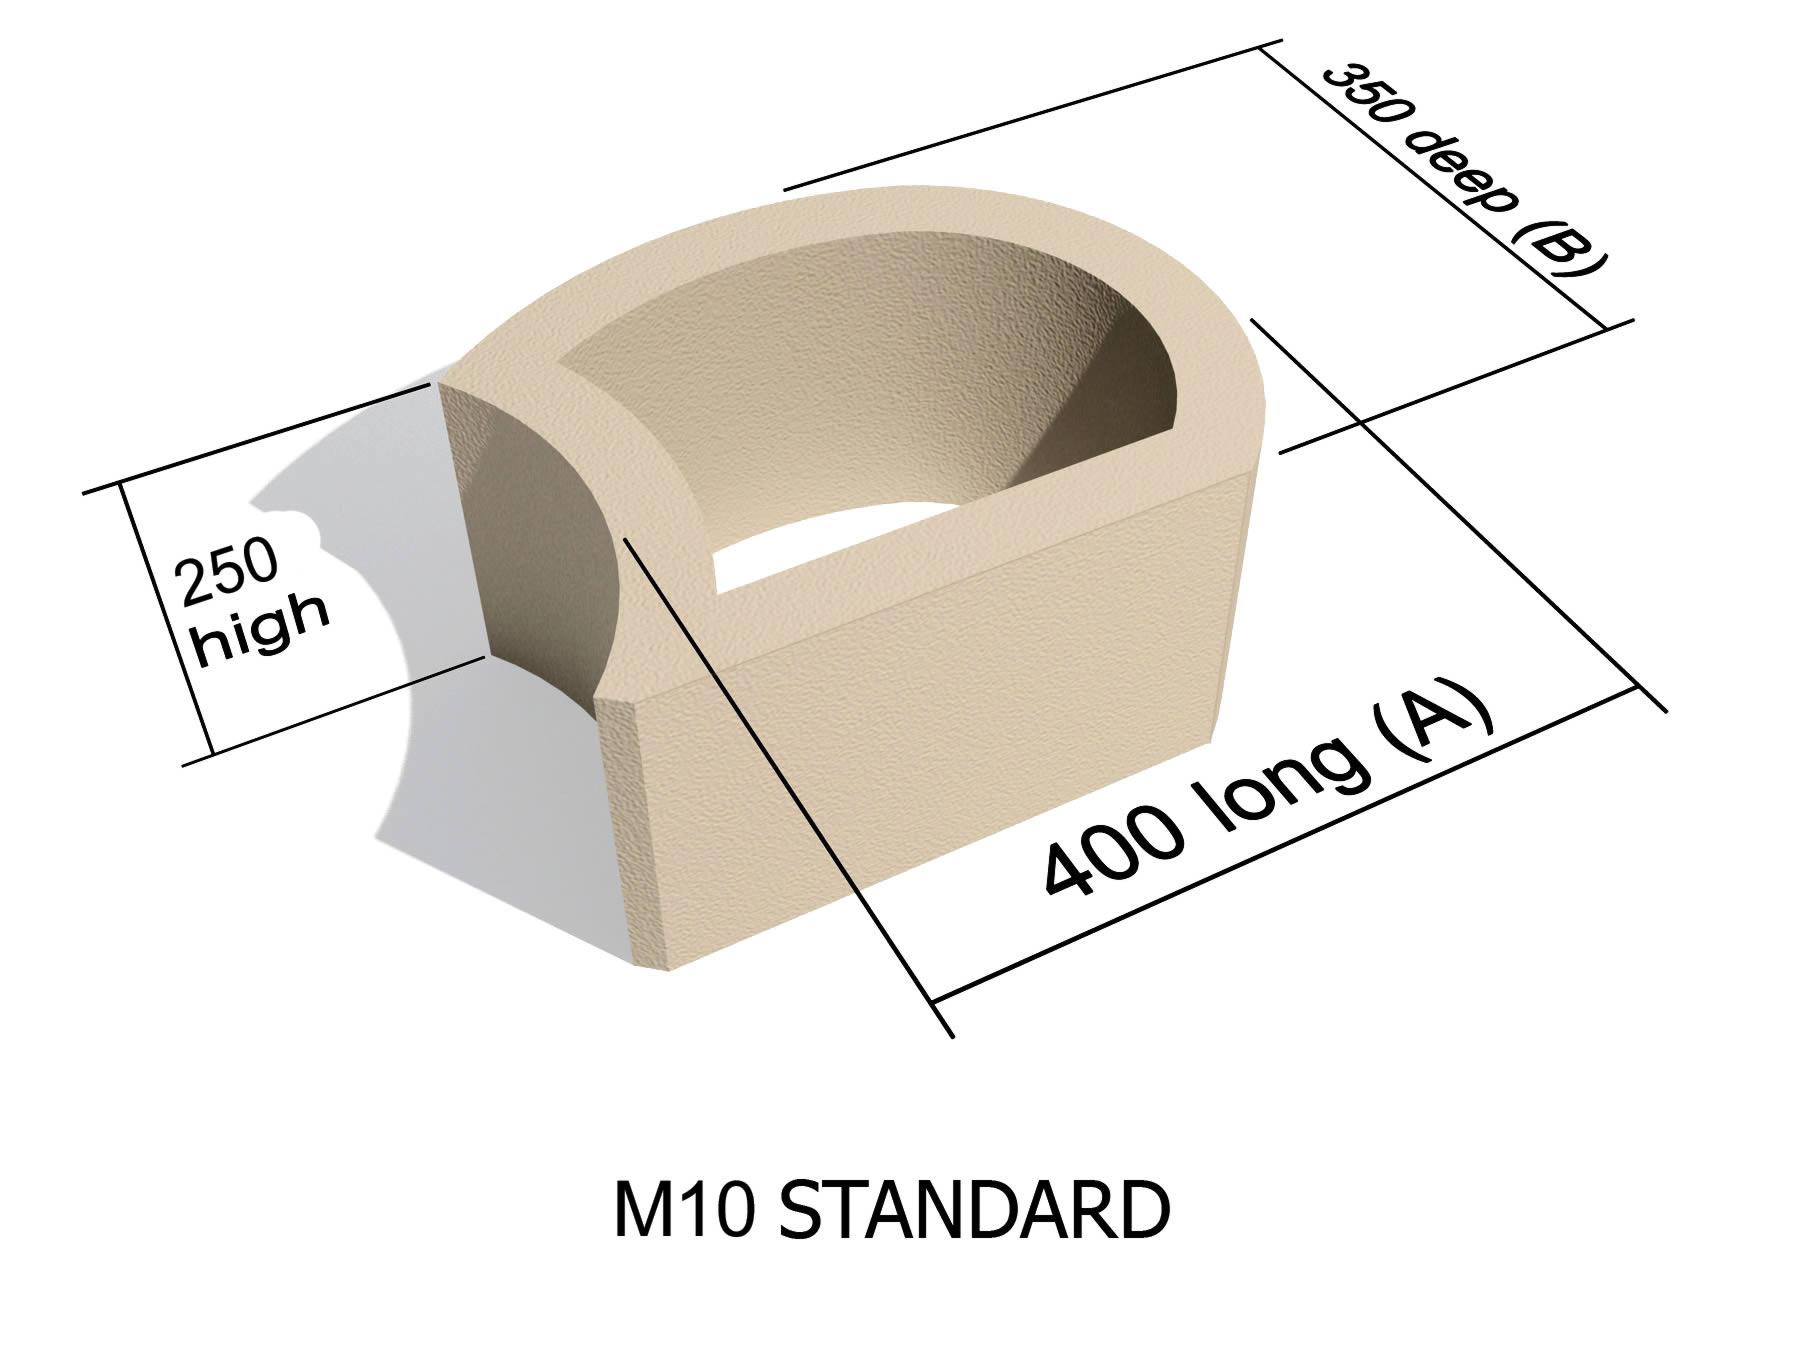 M10 smooth face retaining block